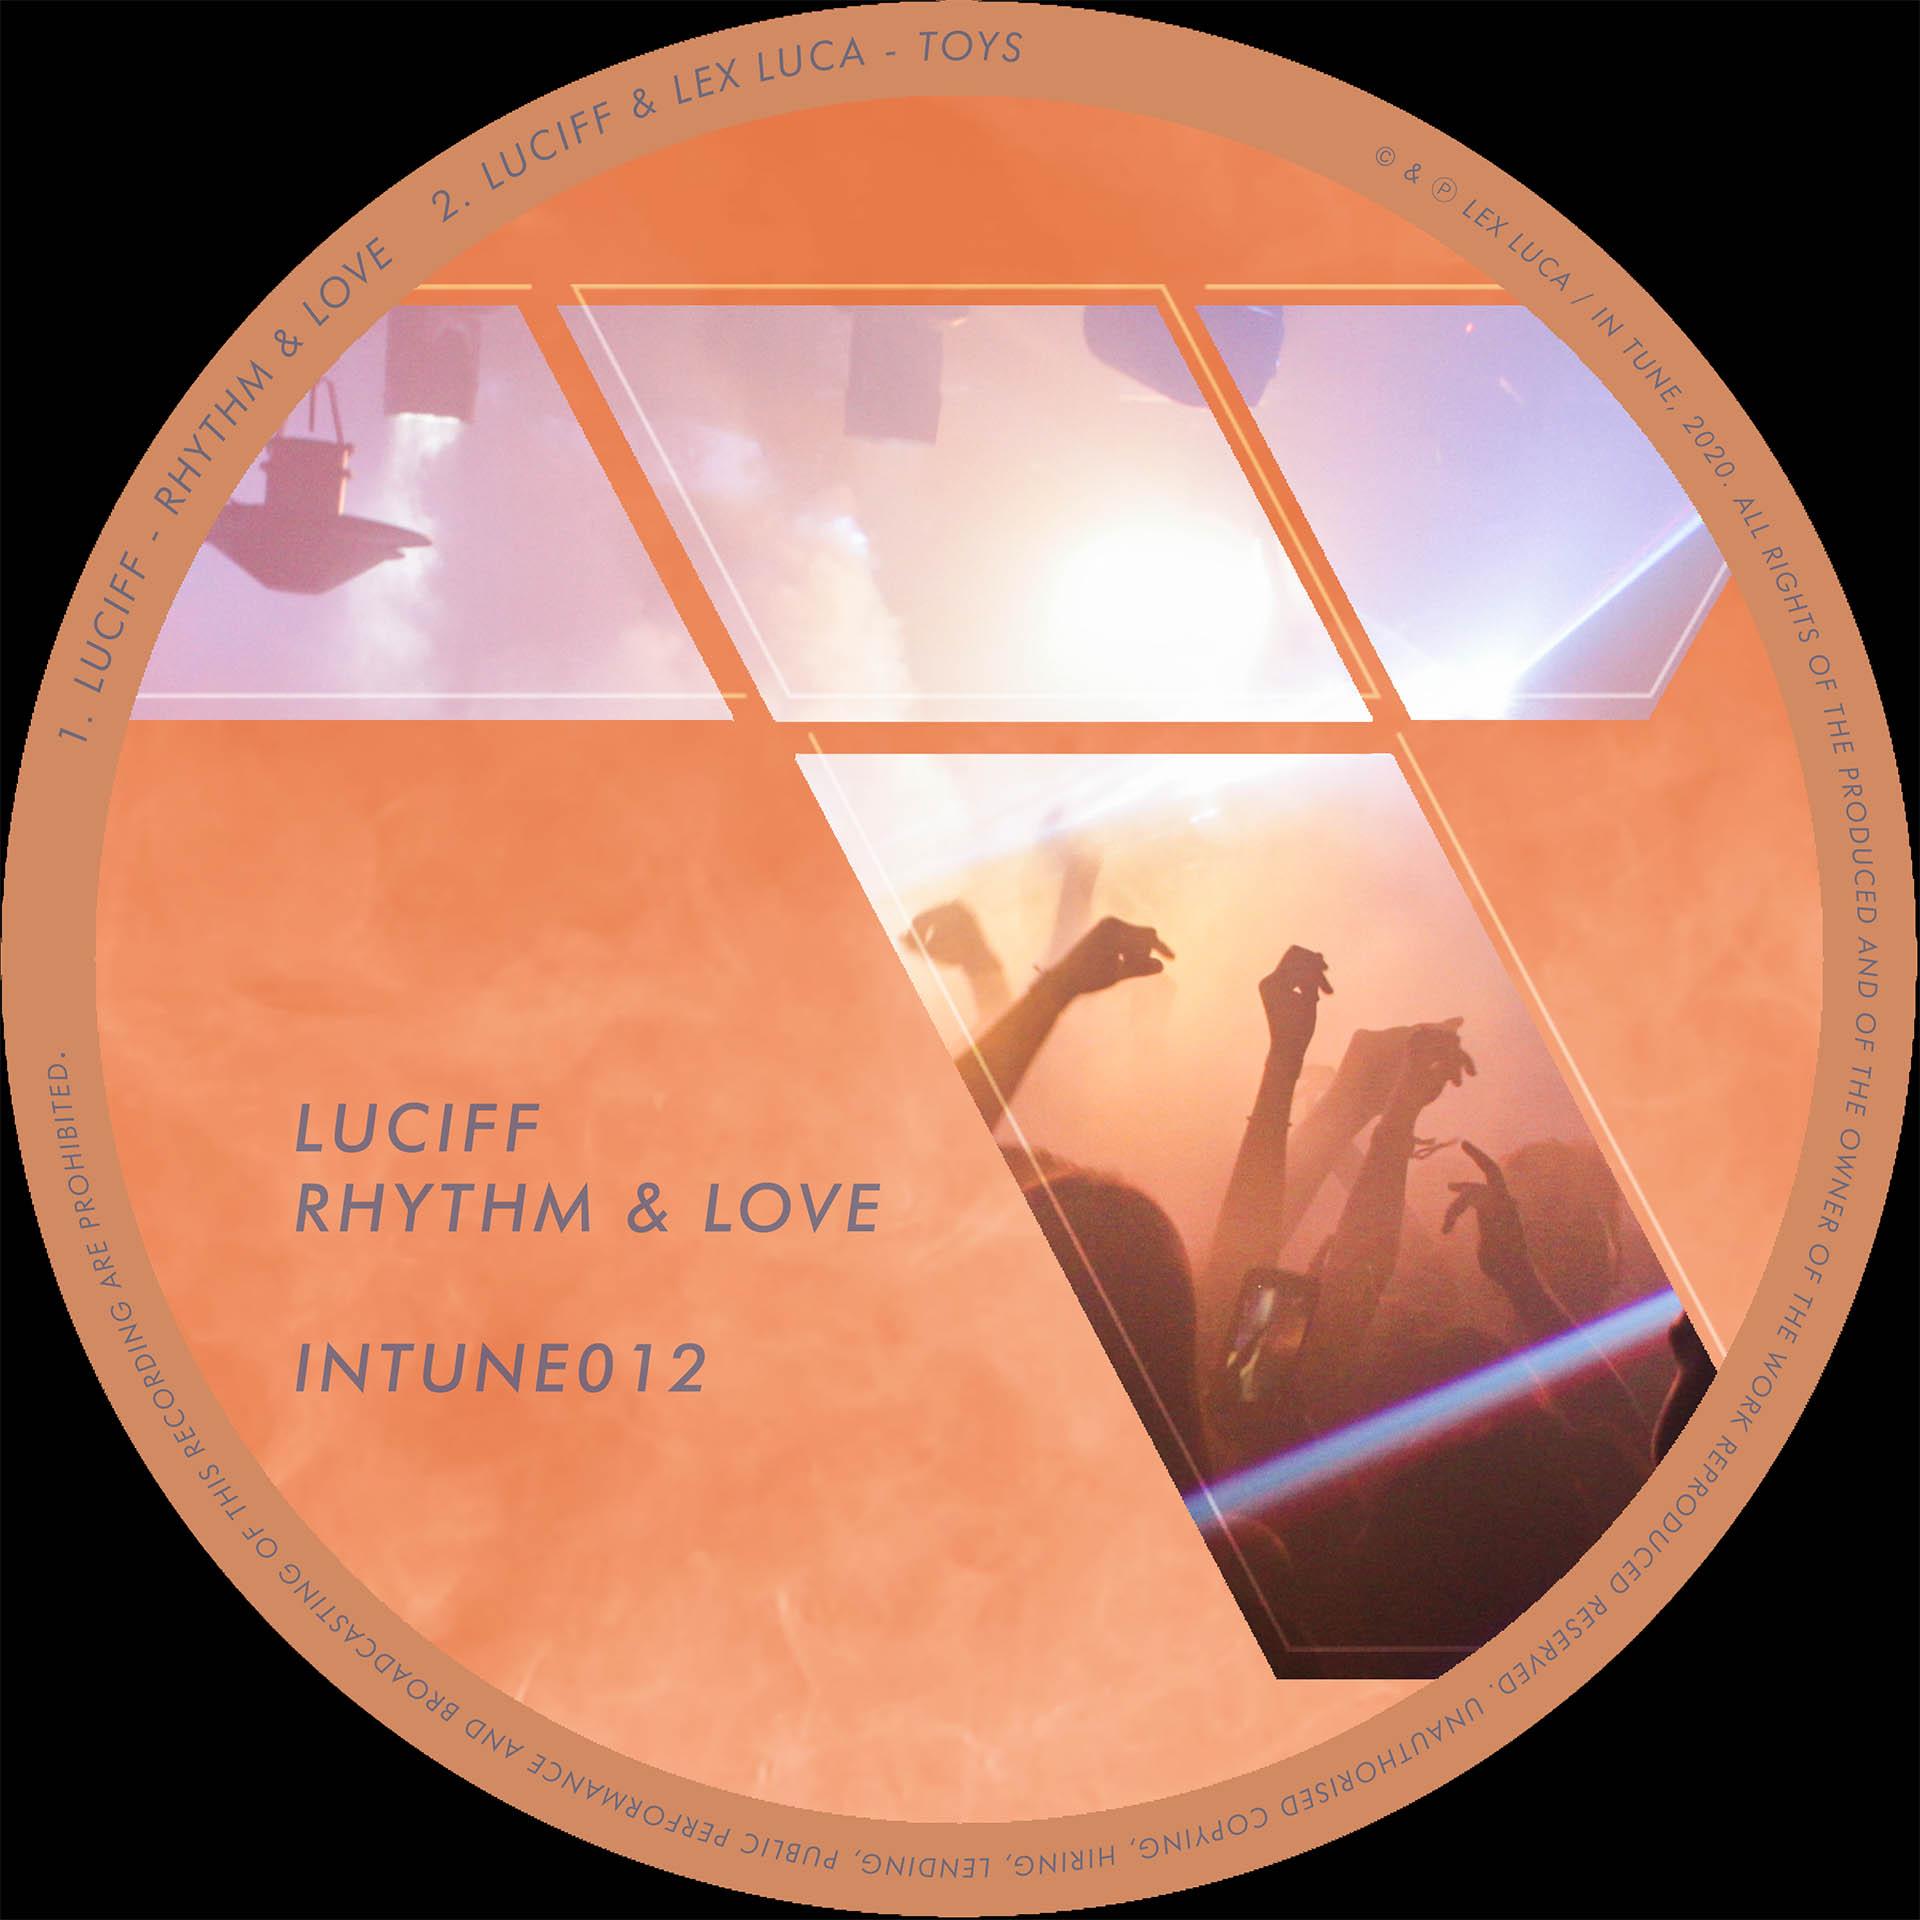 Luciff - Love Rhythm